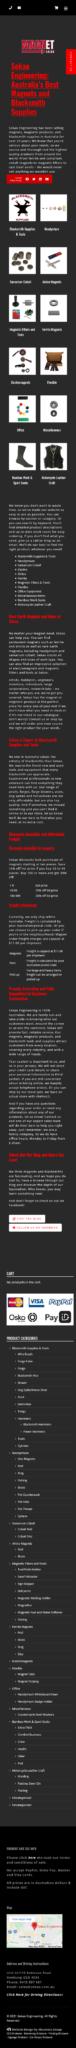 Sekao Engineering: Mobile View